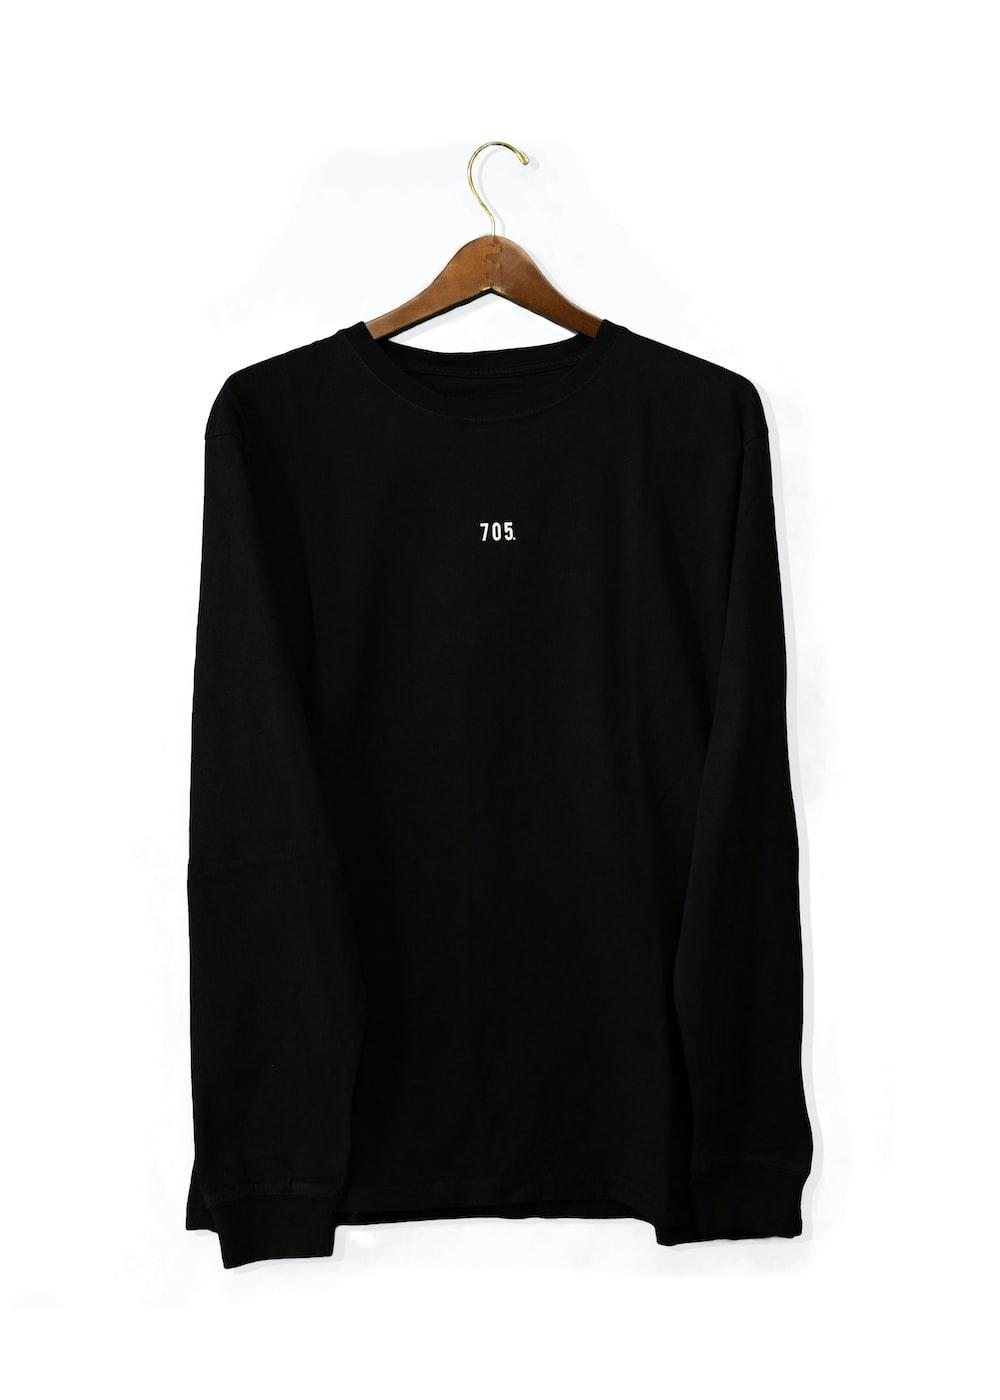 black long sleeve shirt on white table